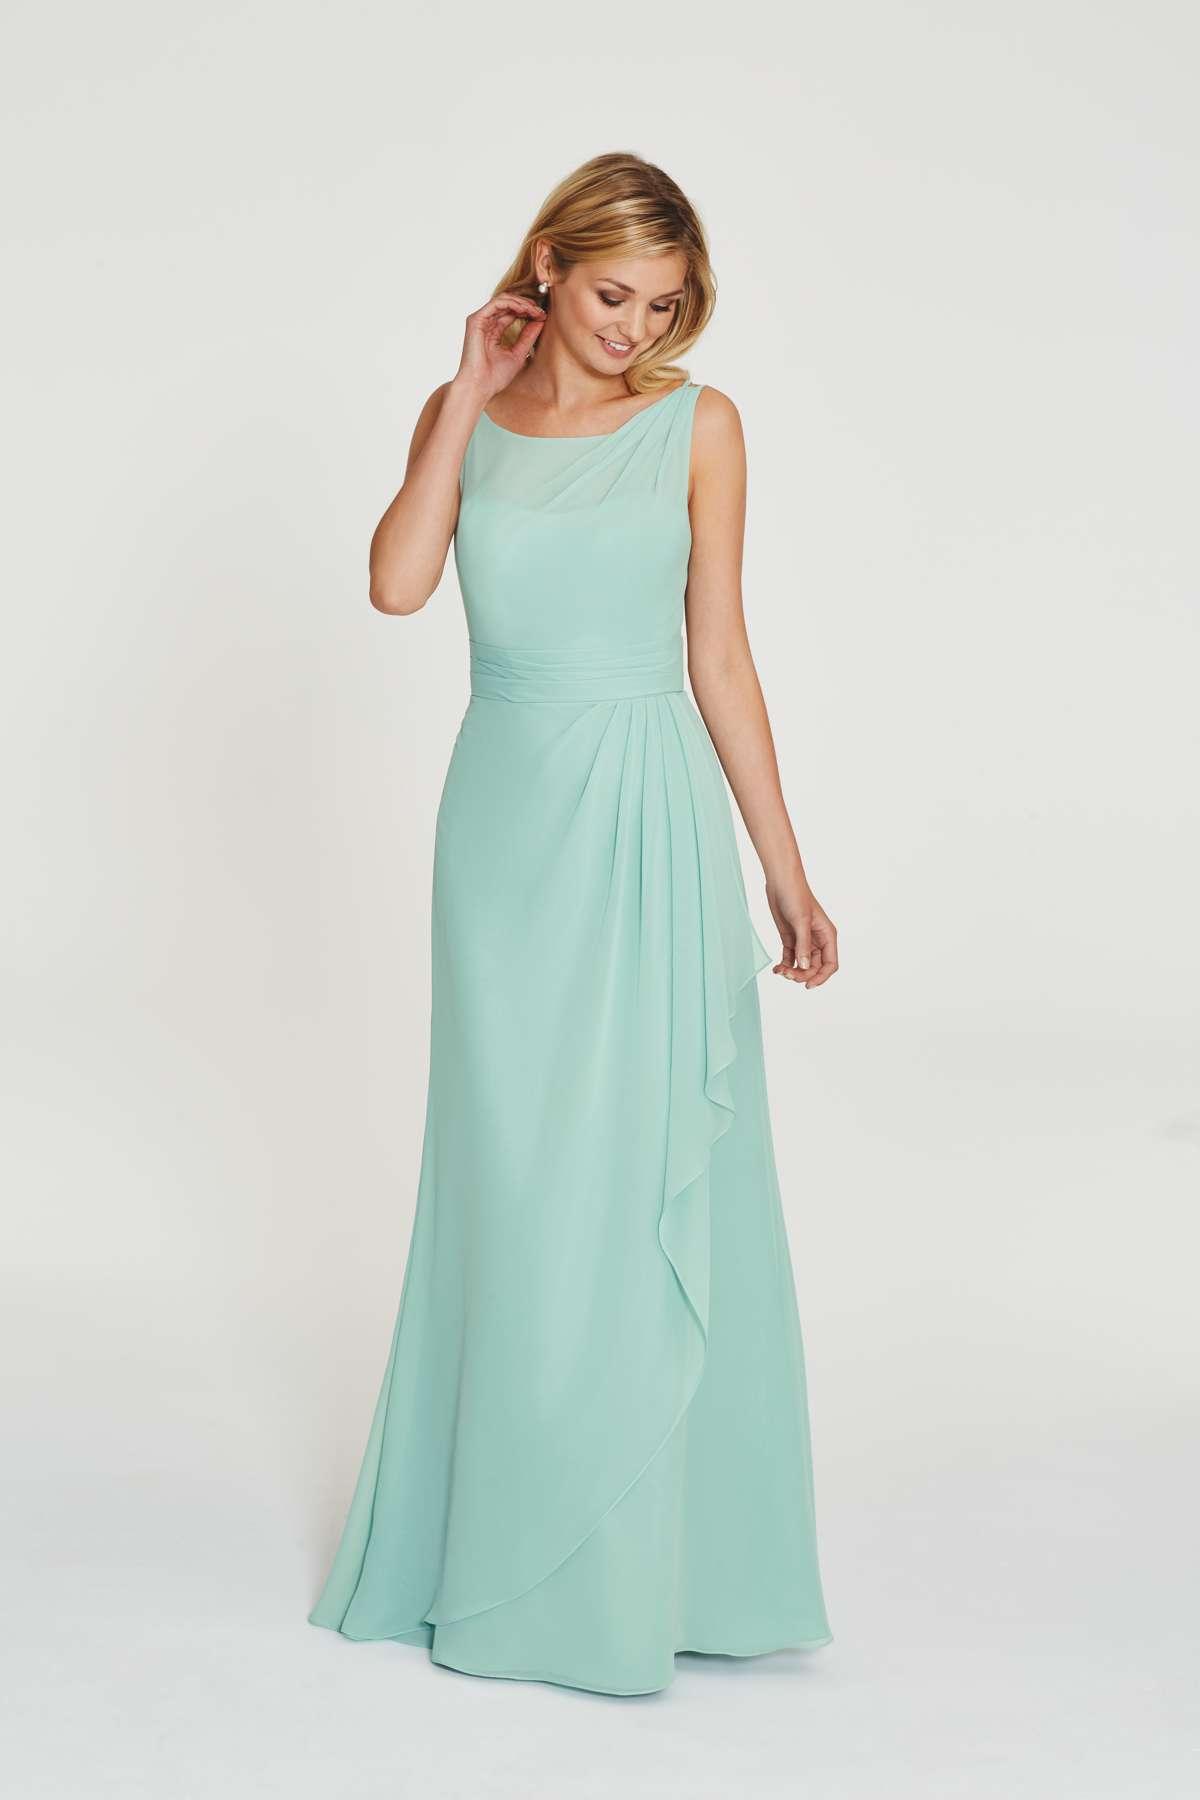 50 sensational bridesmaid dresses! - Love Our Wedding